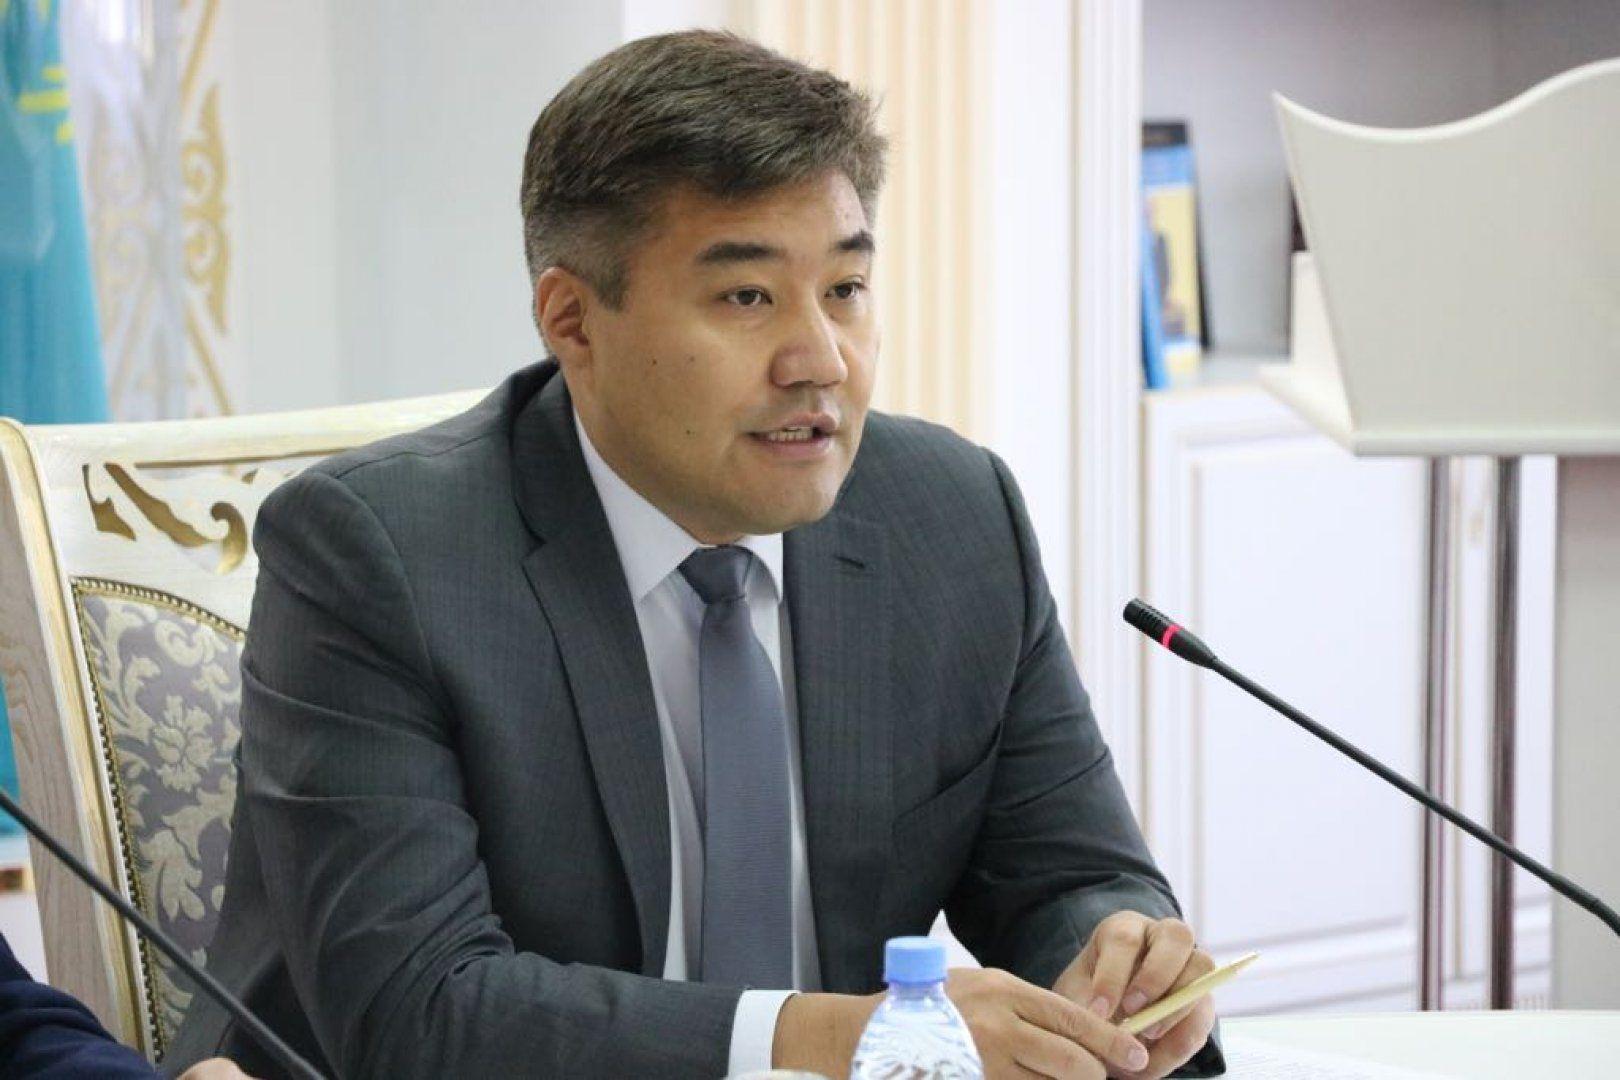 Число суицидов среди молодежи снизилось в Казахстане на 3,9%